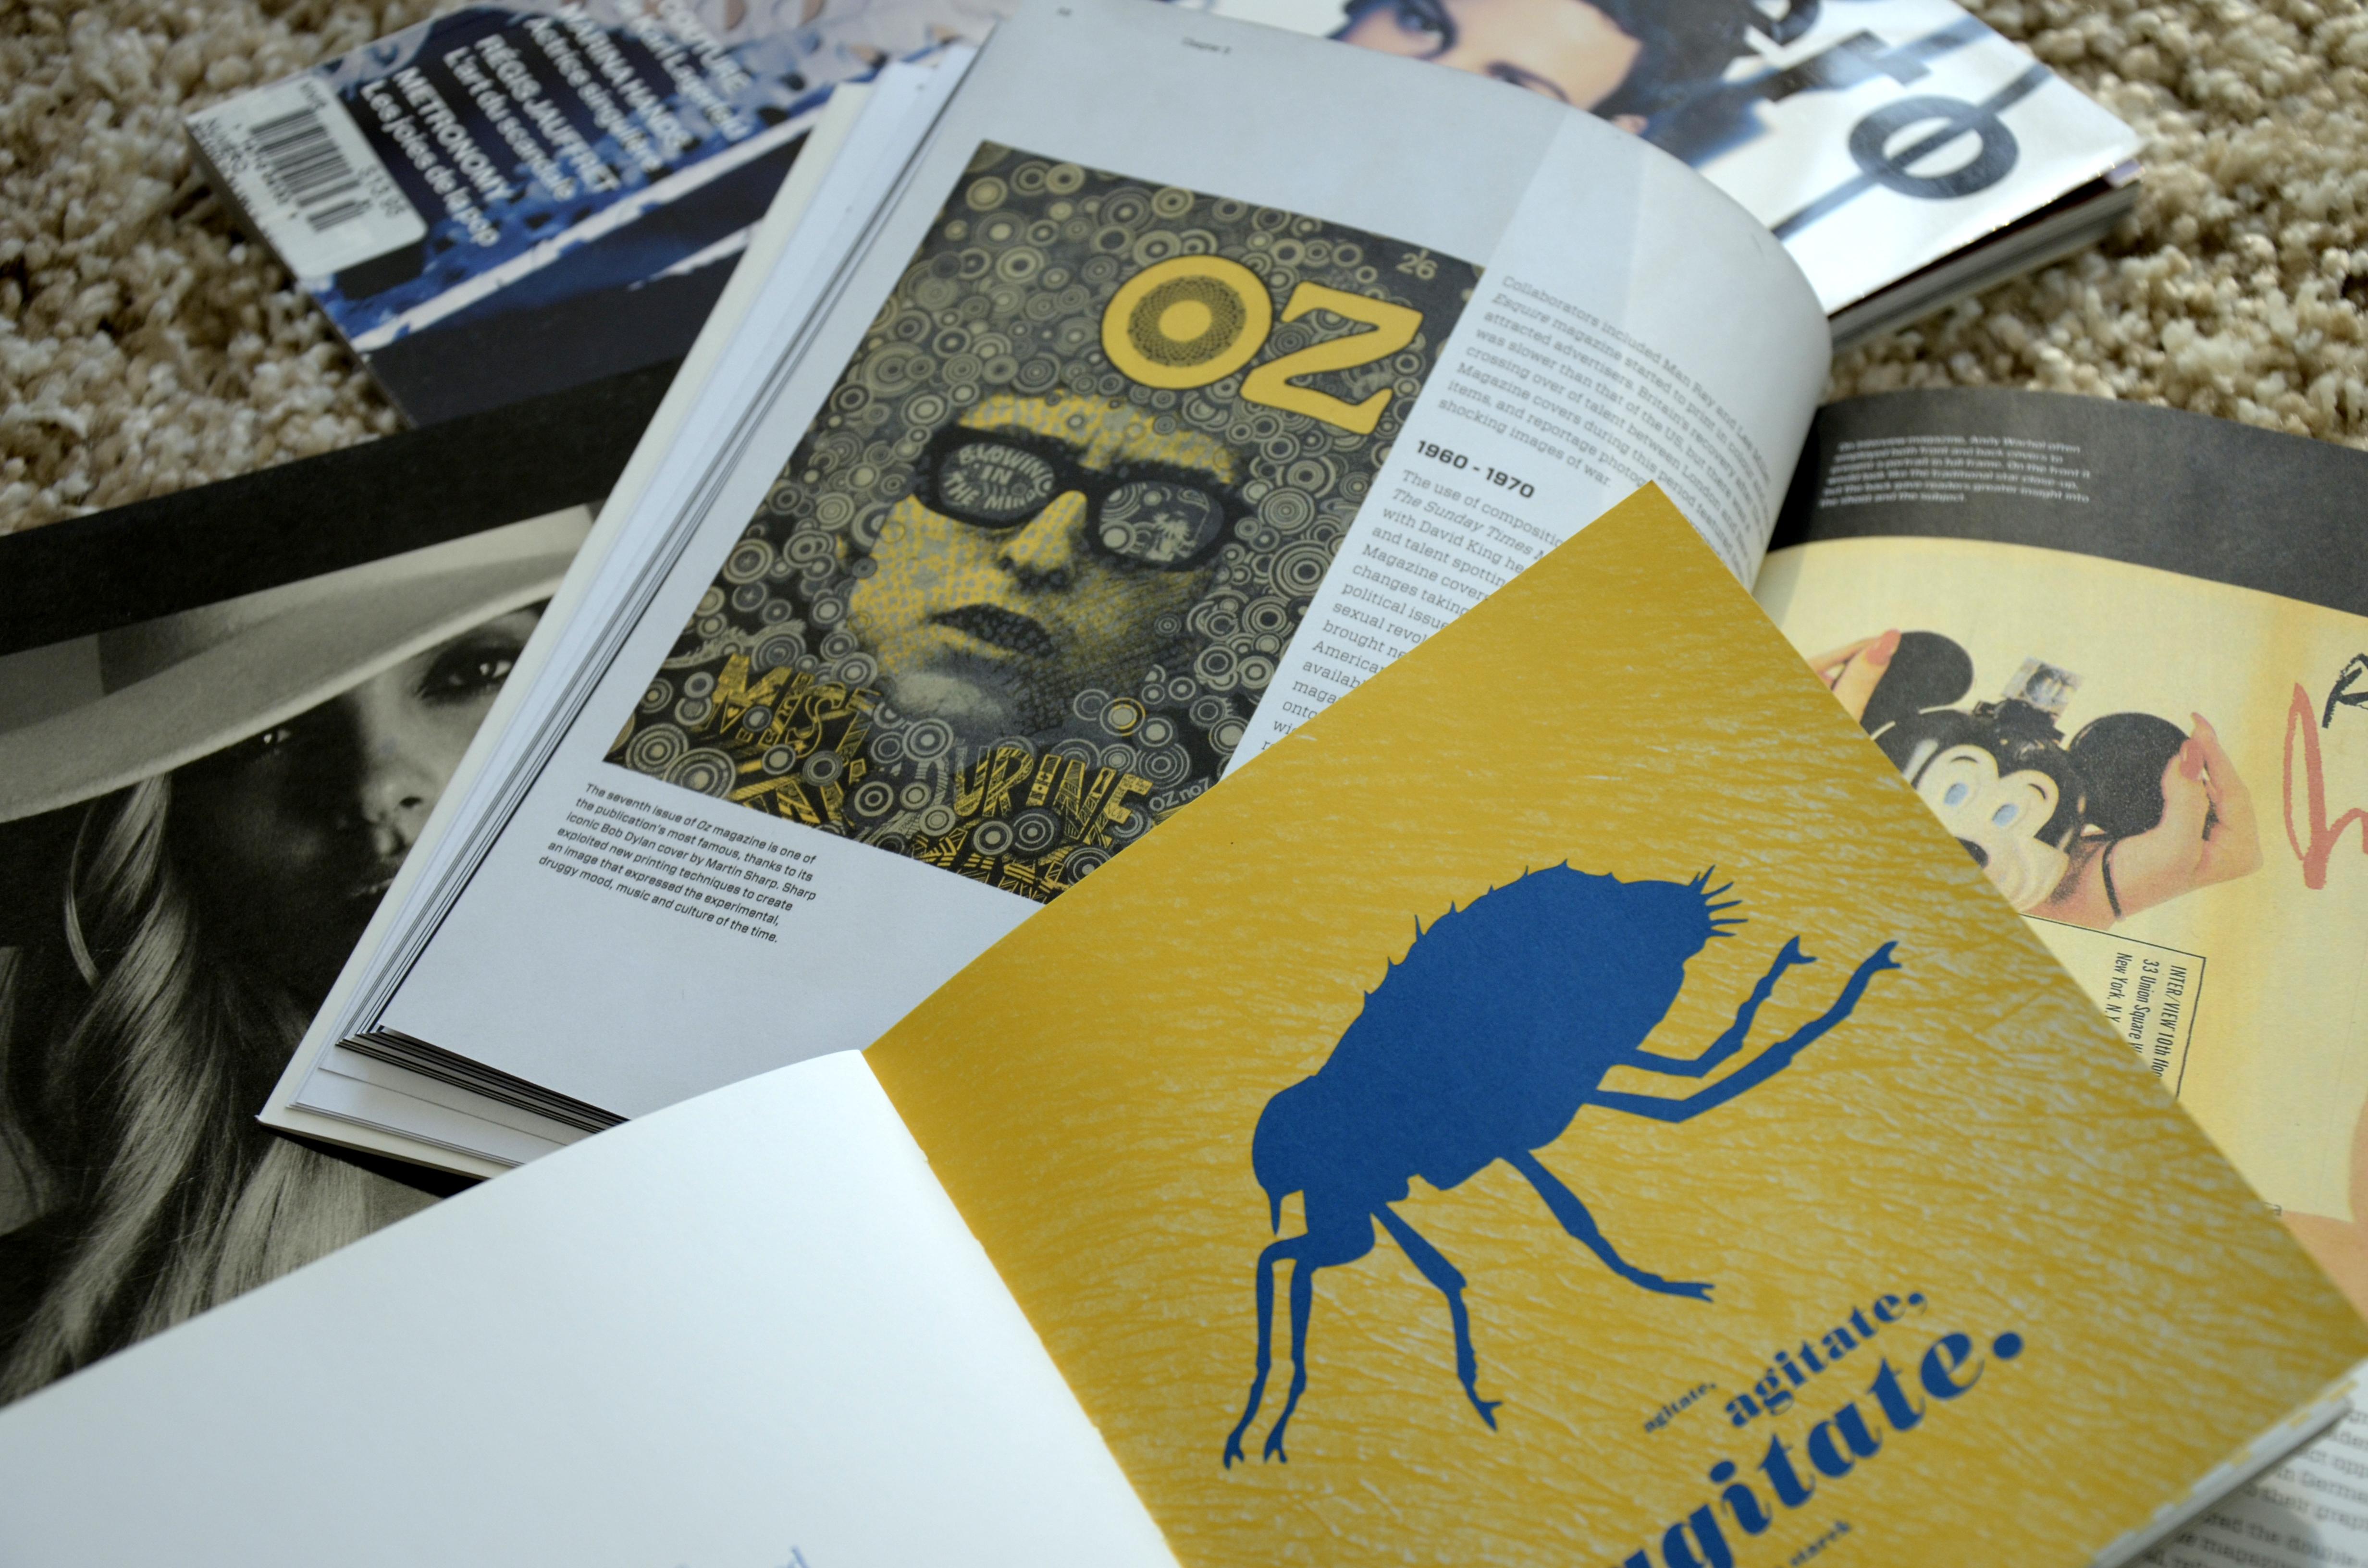 Design books, still-life